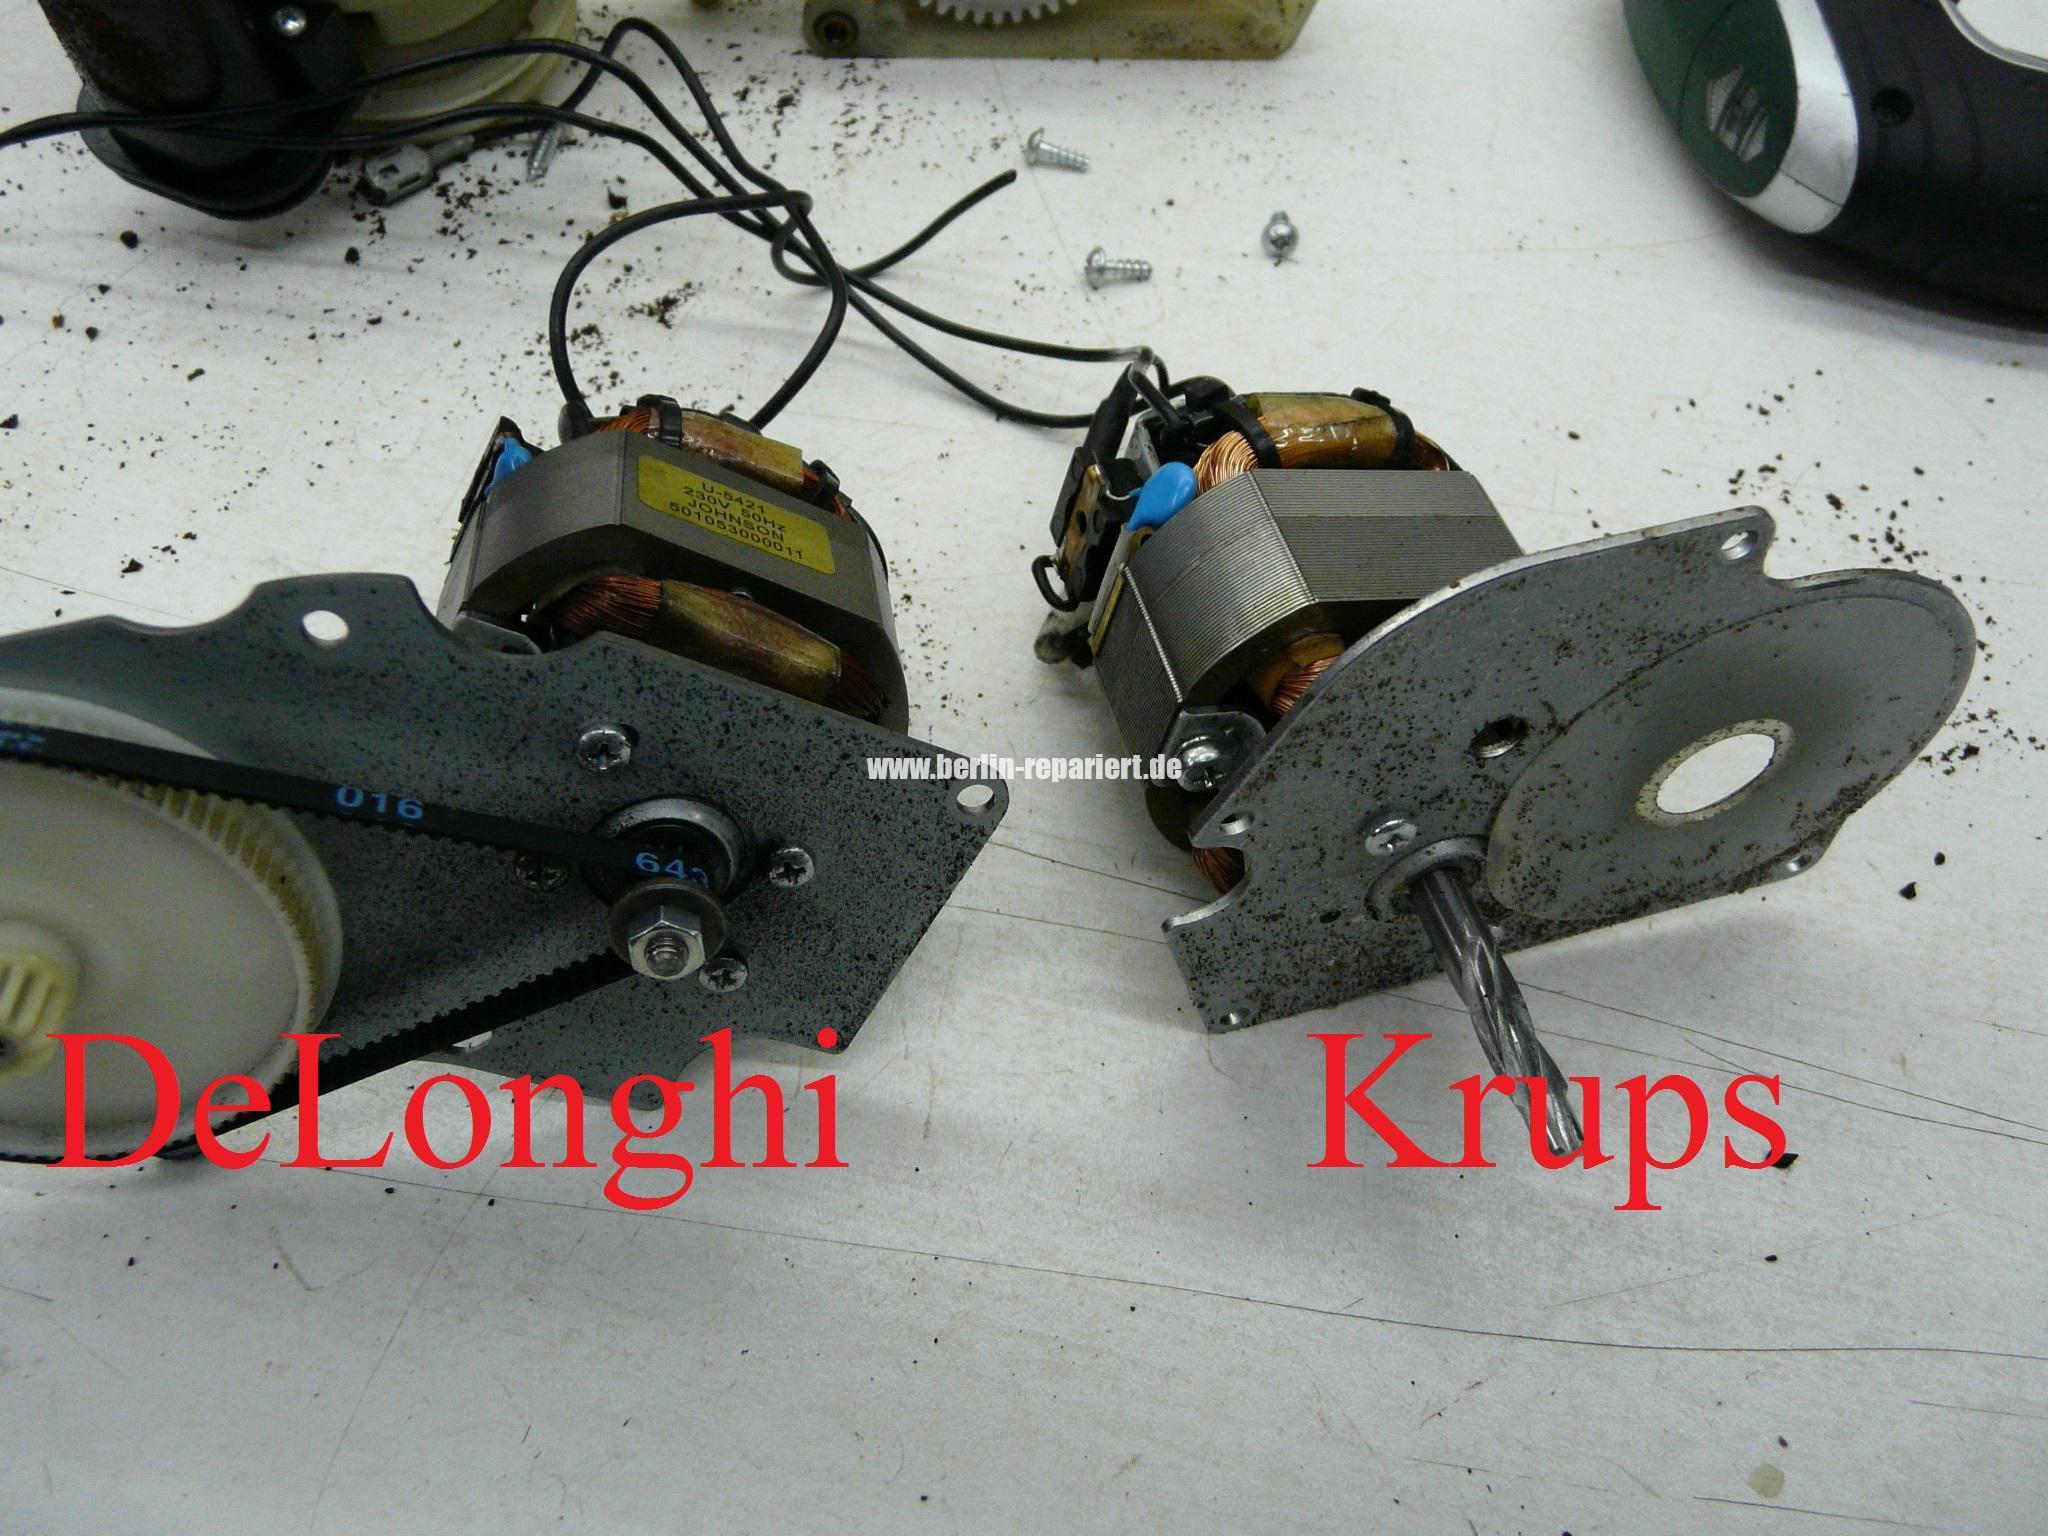 krups xp mahlwerk motor defekt mit delonghi repariert leon s blog. Black Bedroom Furniture Sets. Home Design Ideas